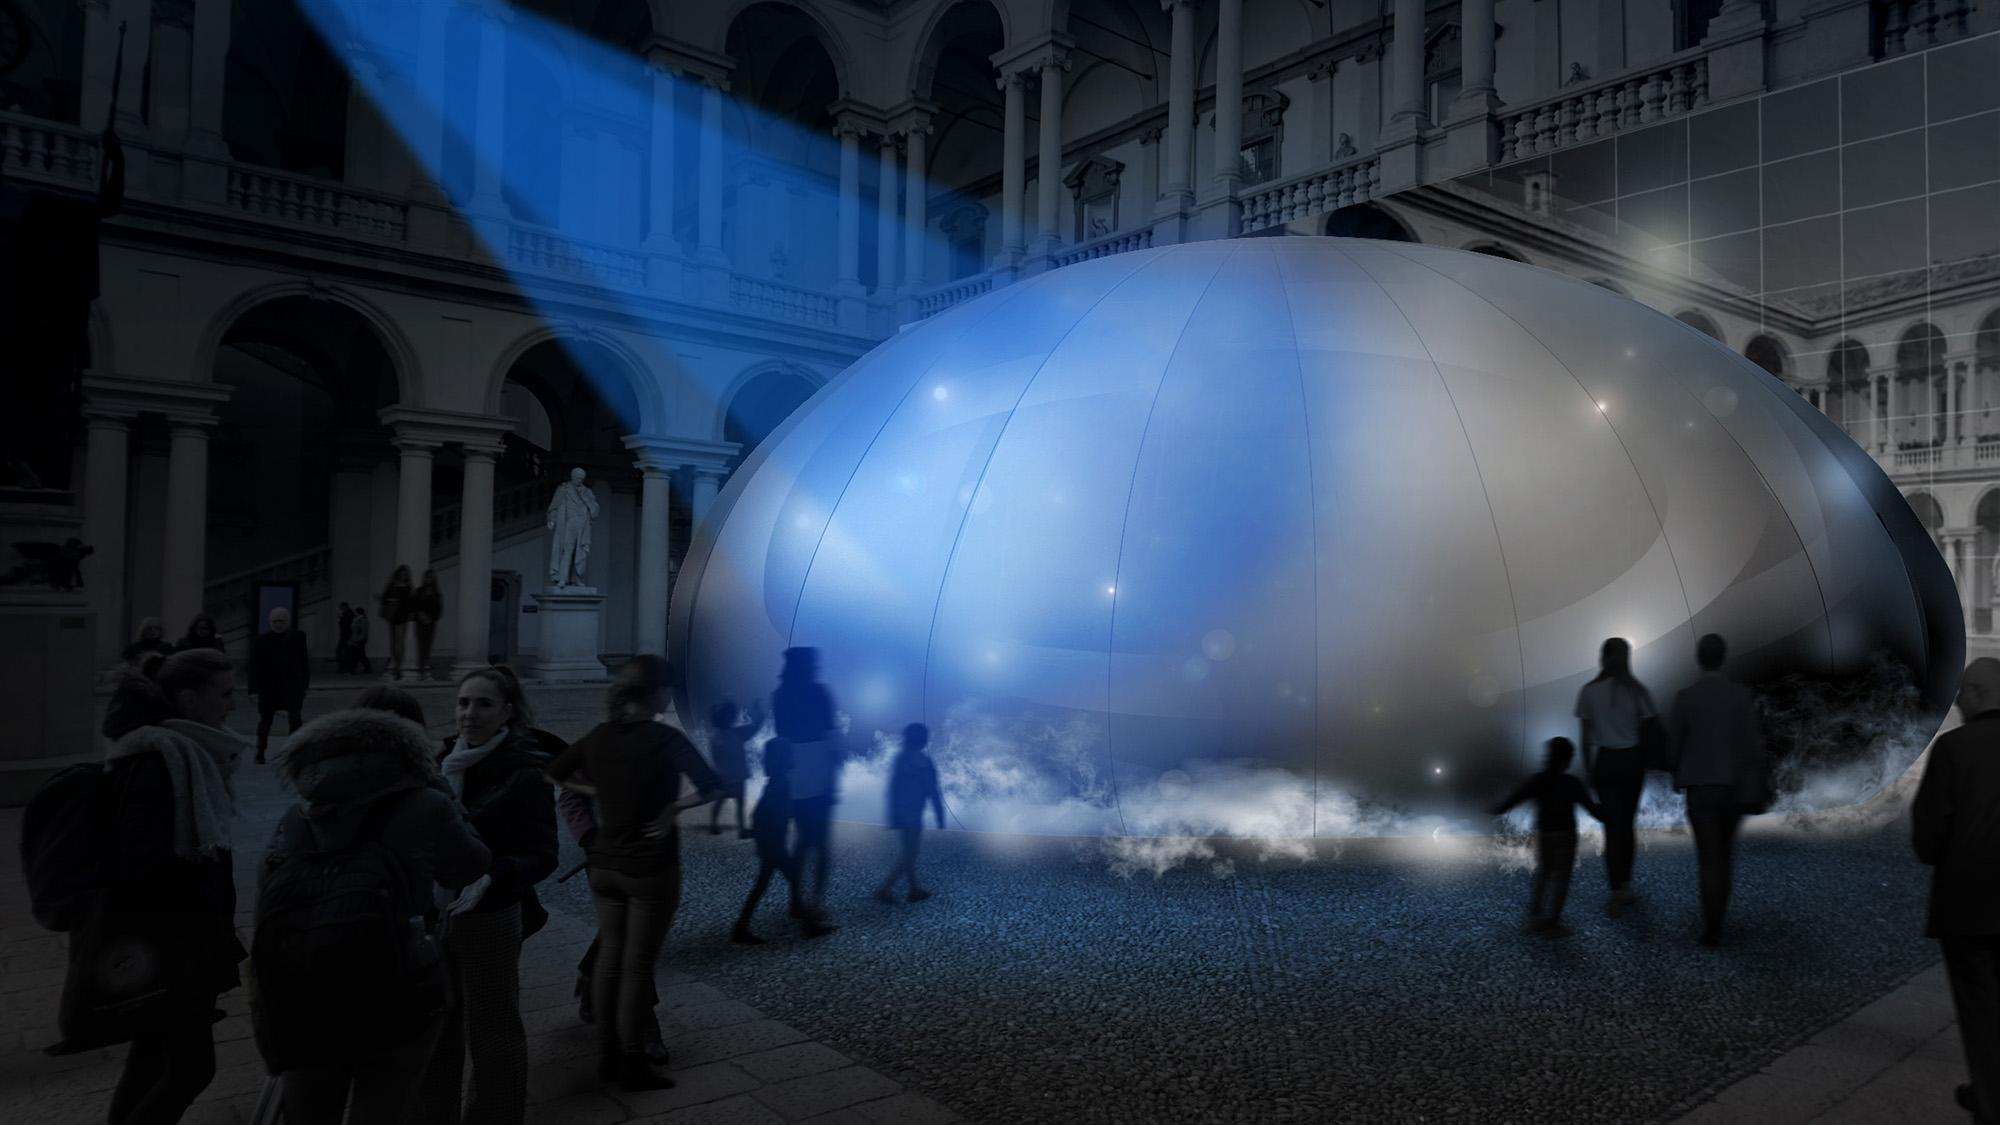 photo: panasonic's air inventions in Milan Design Week 2018